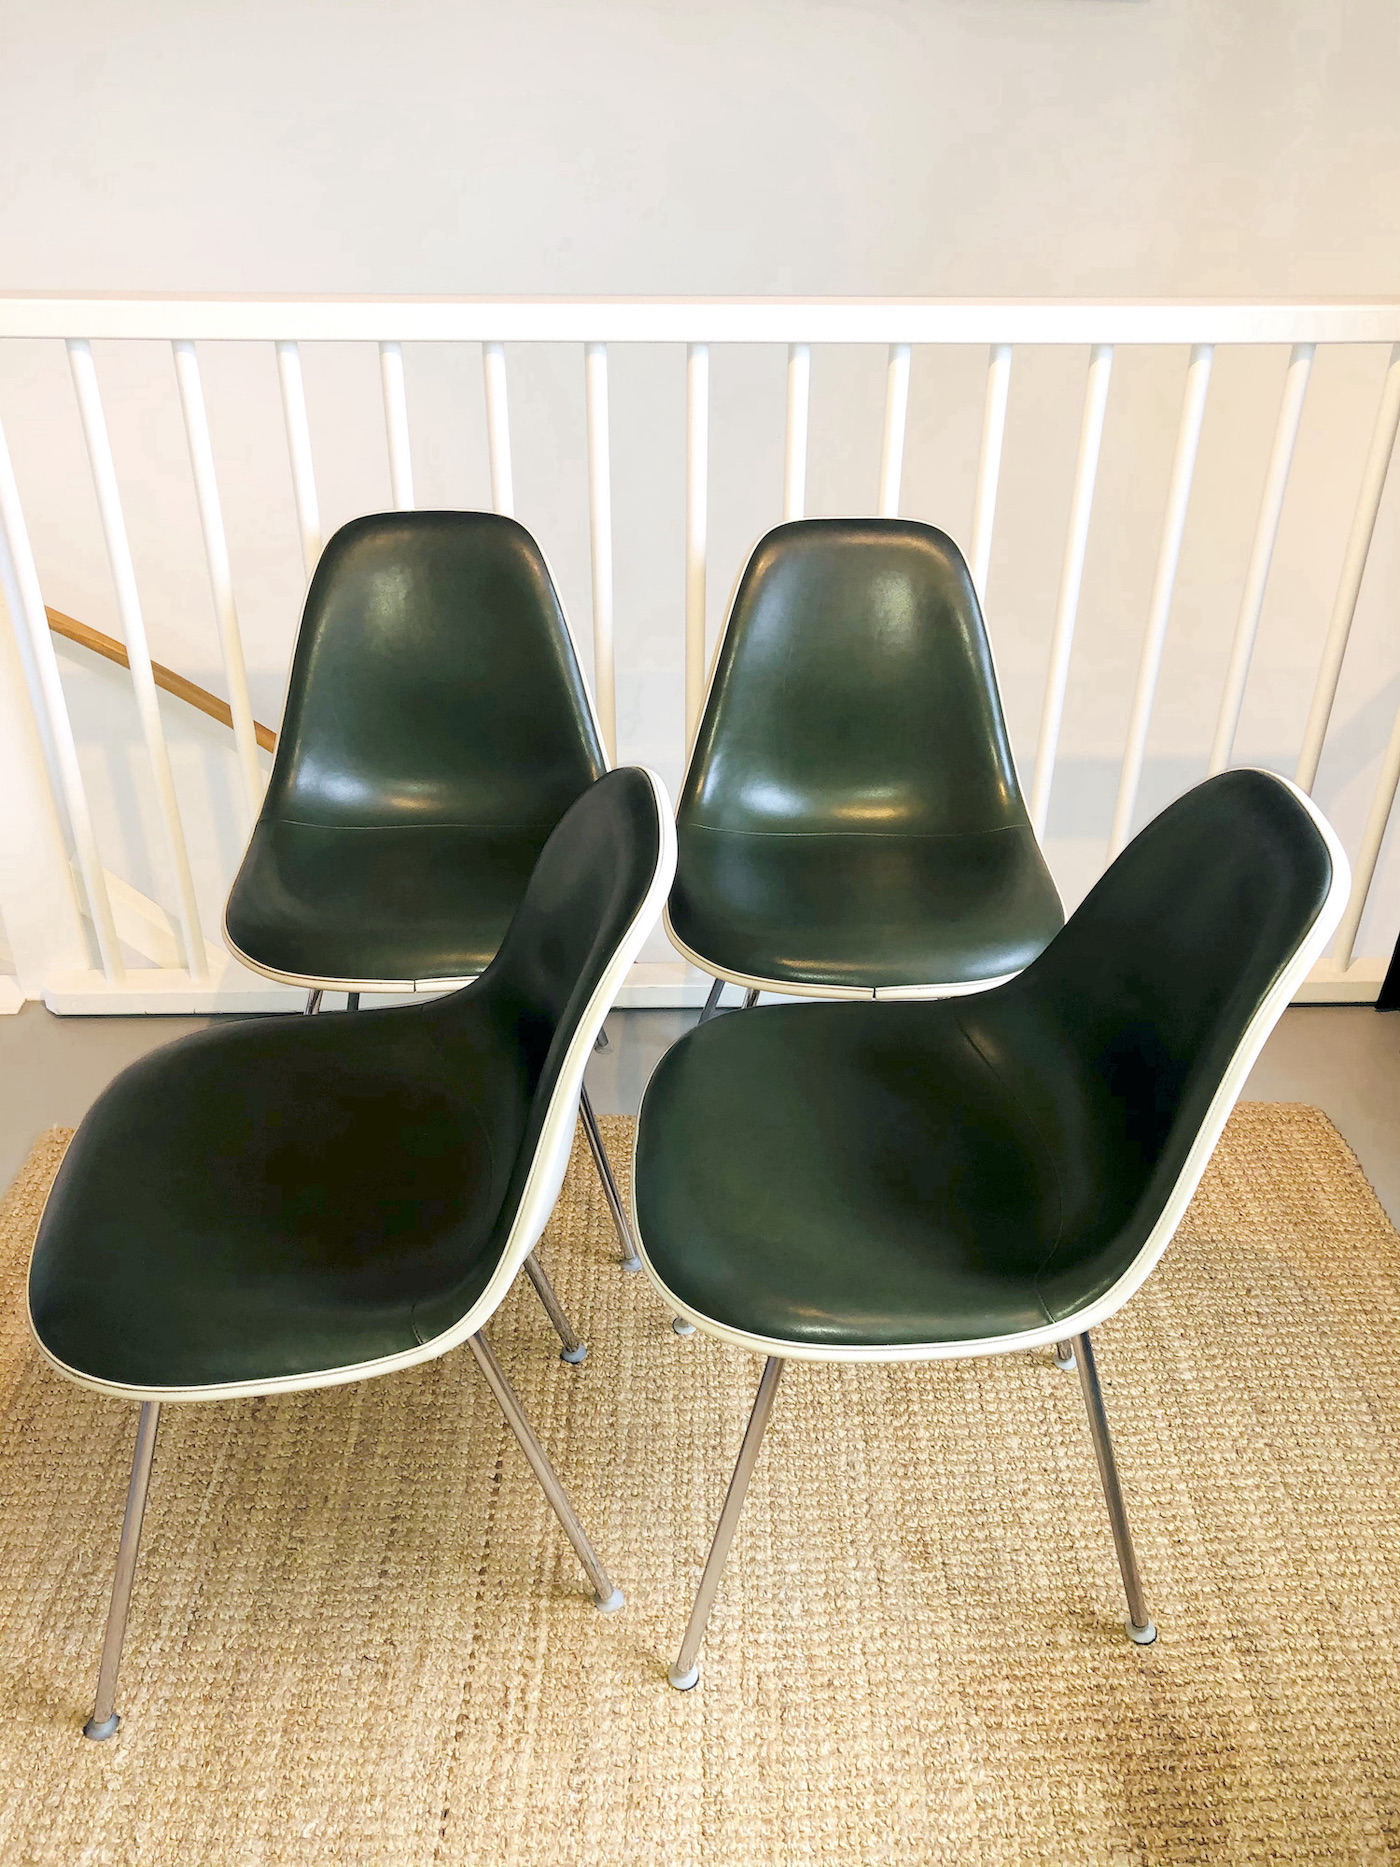 Green 1950s Herman Miller Eames DSX (& Variants) Side